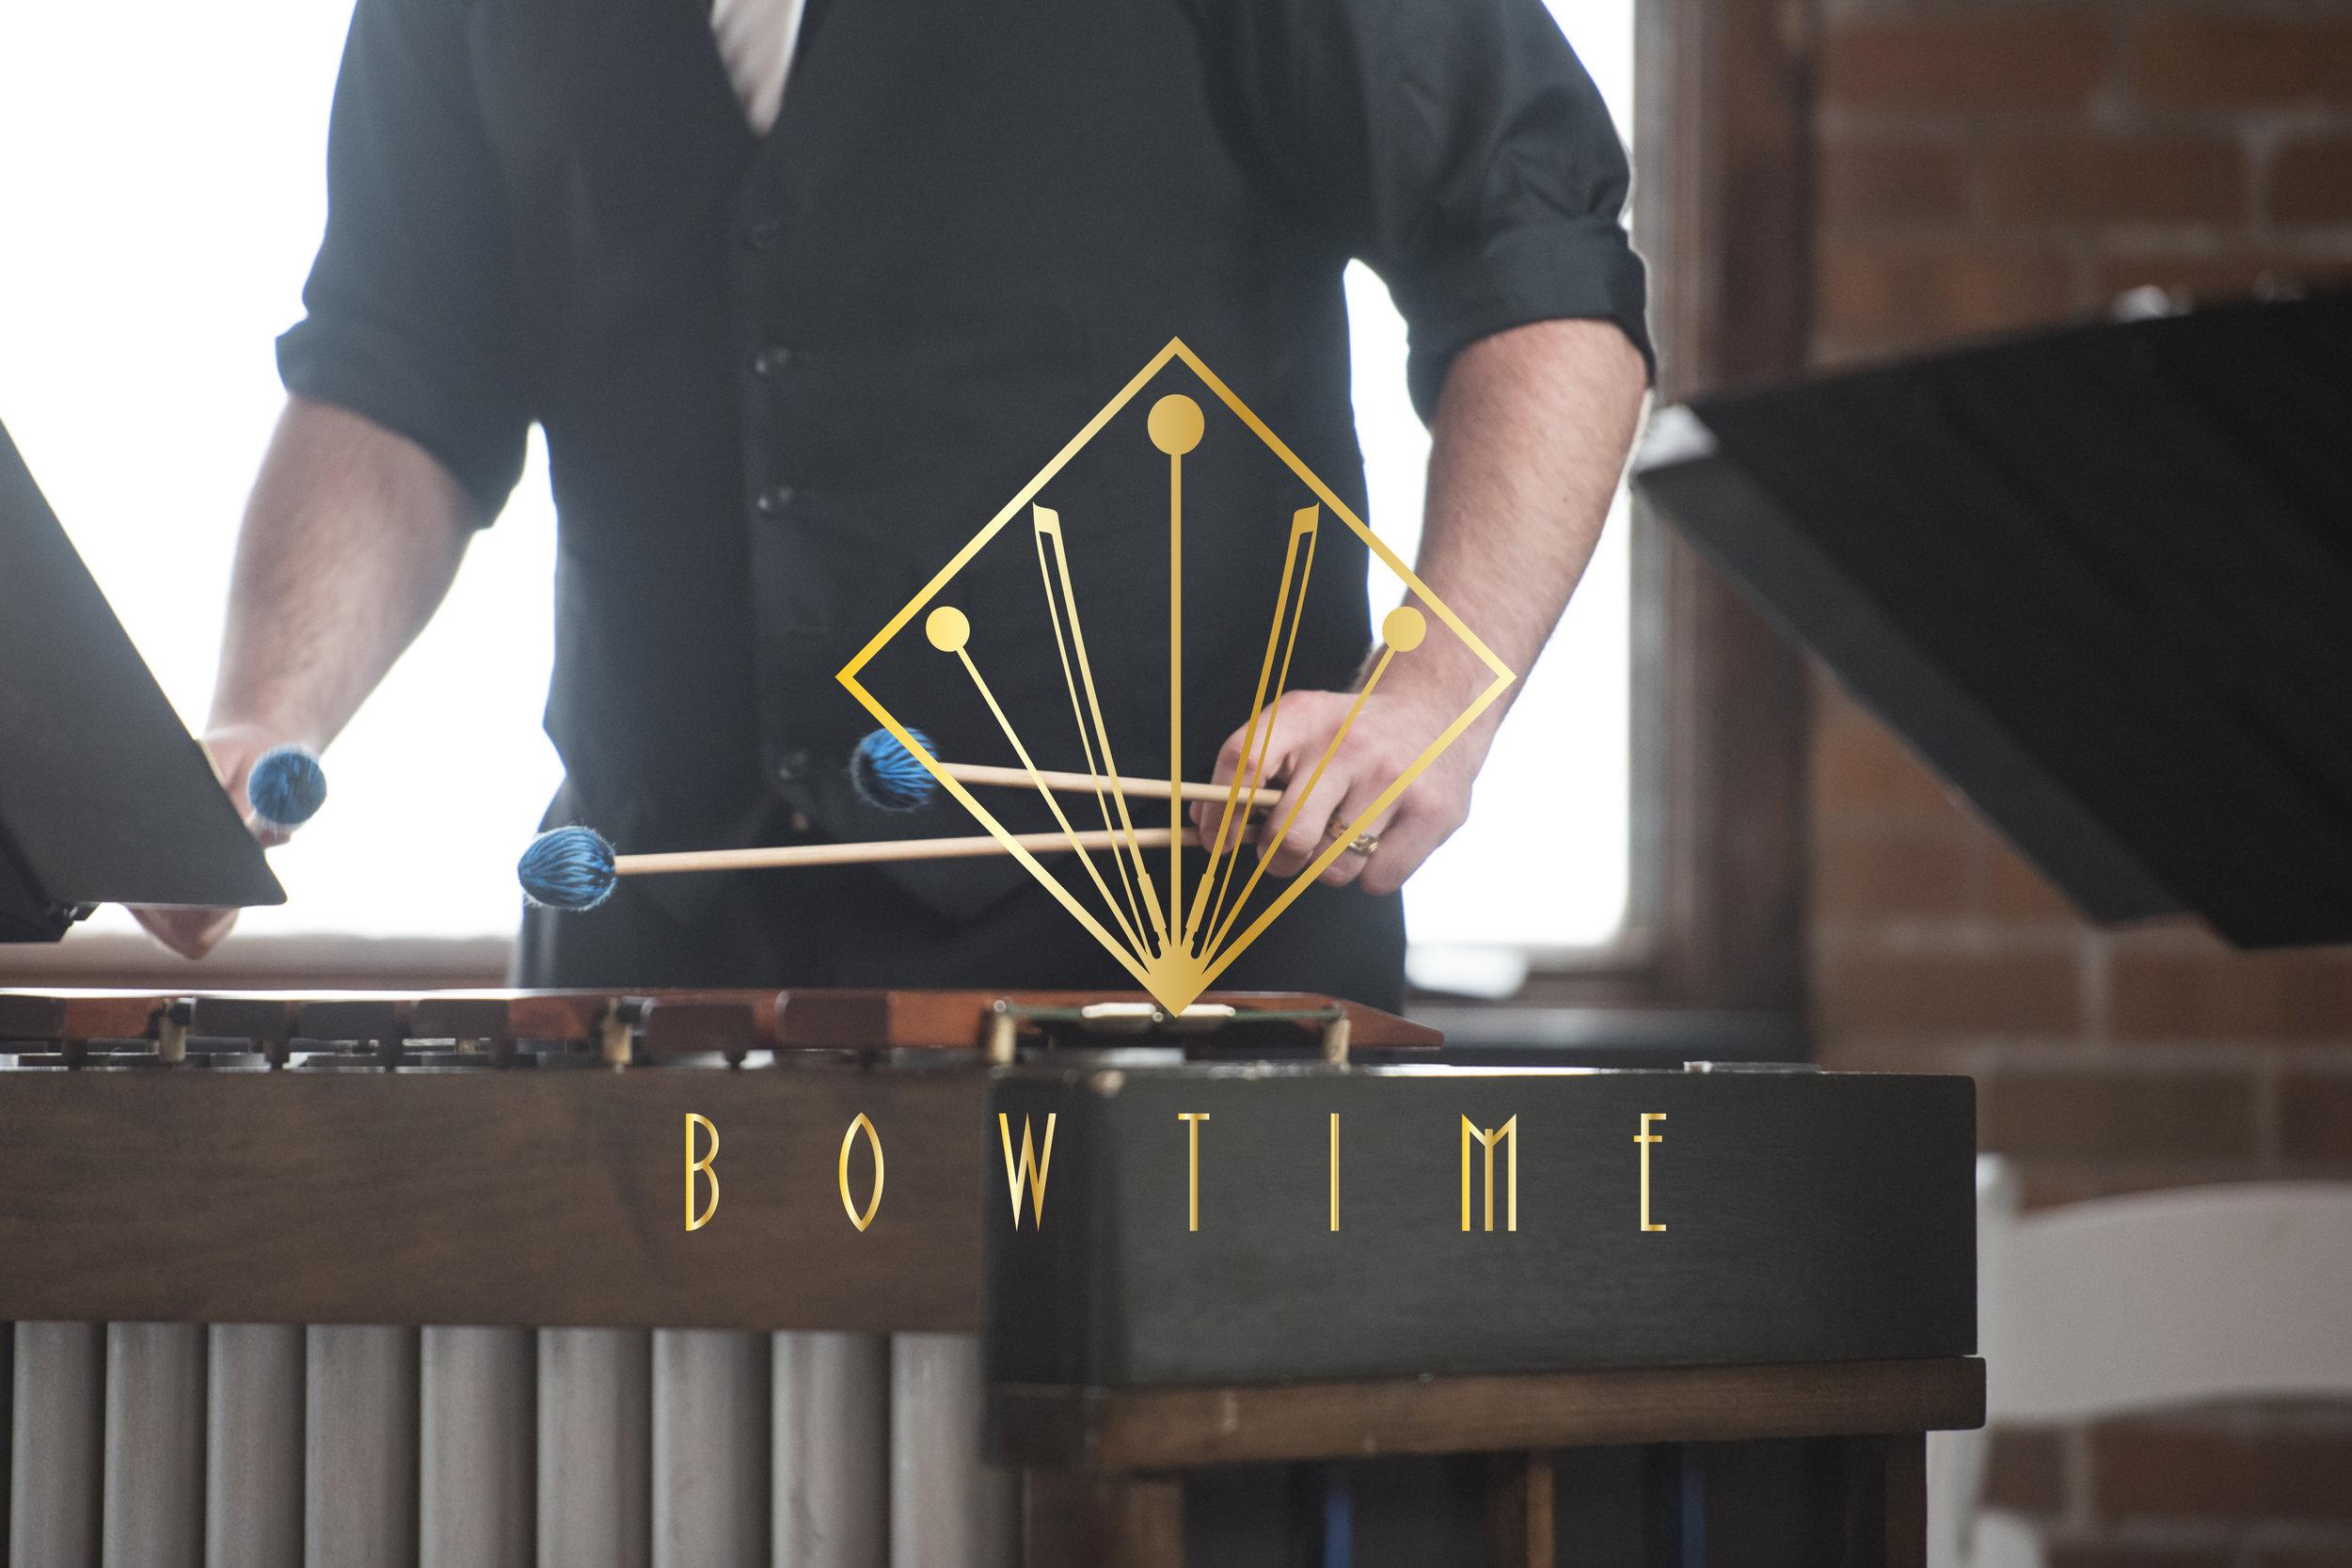 BOWTIME PIX 12X8 w logo 5in-9.jpg